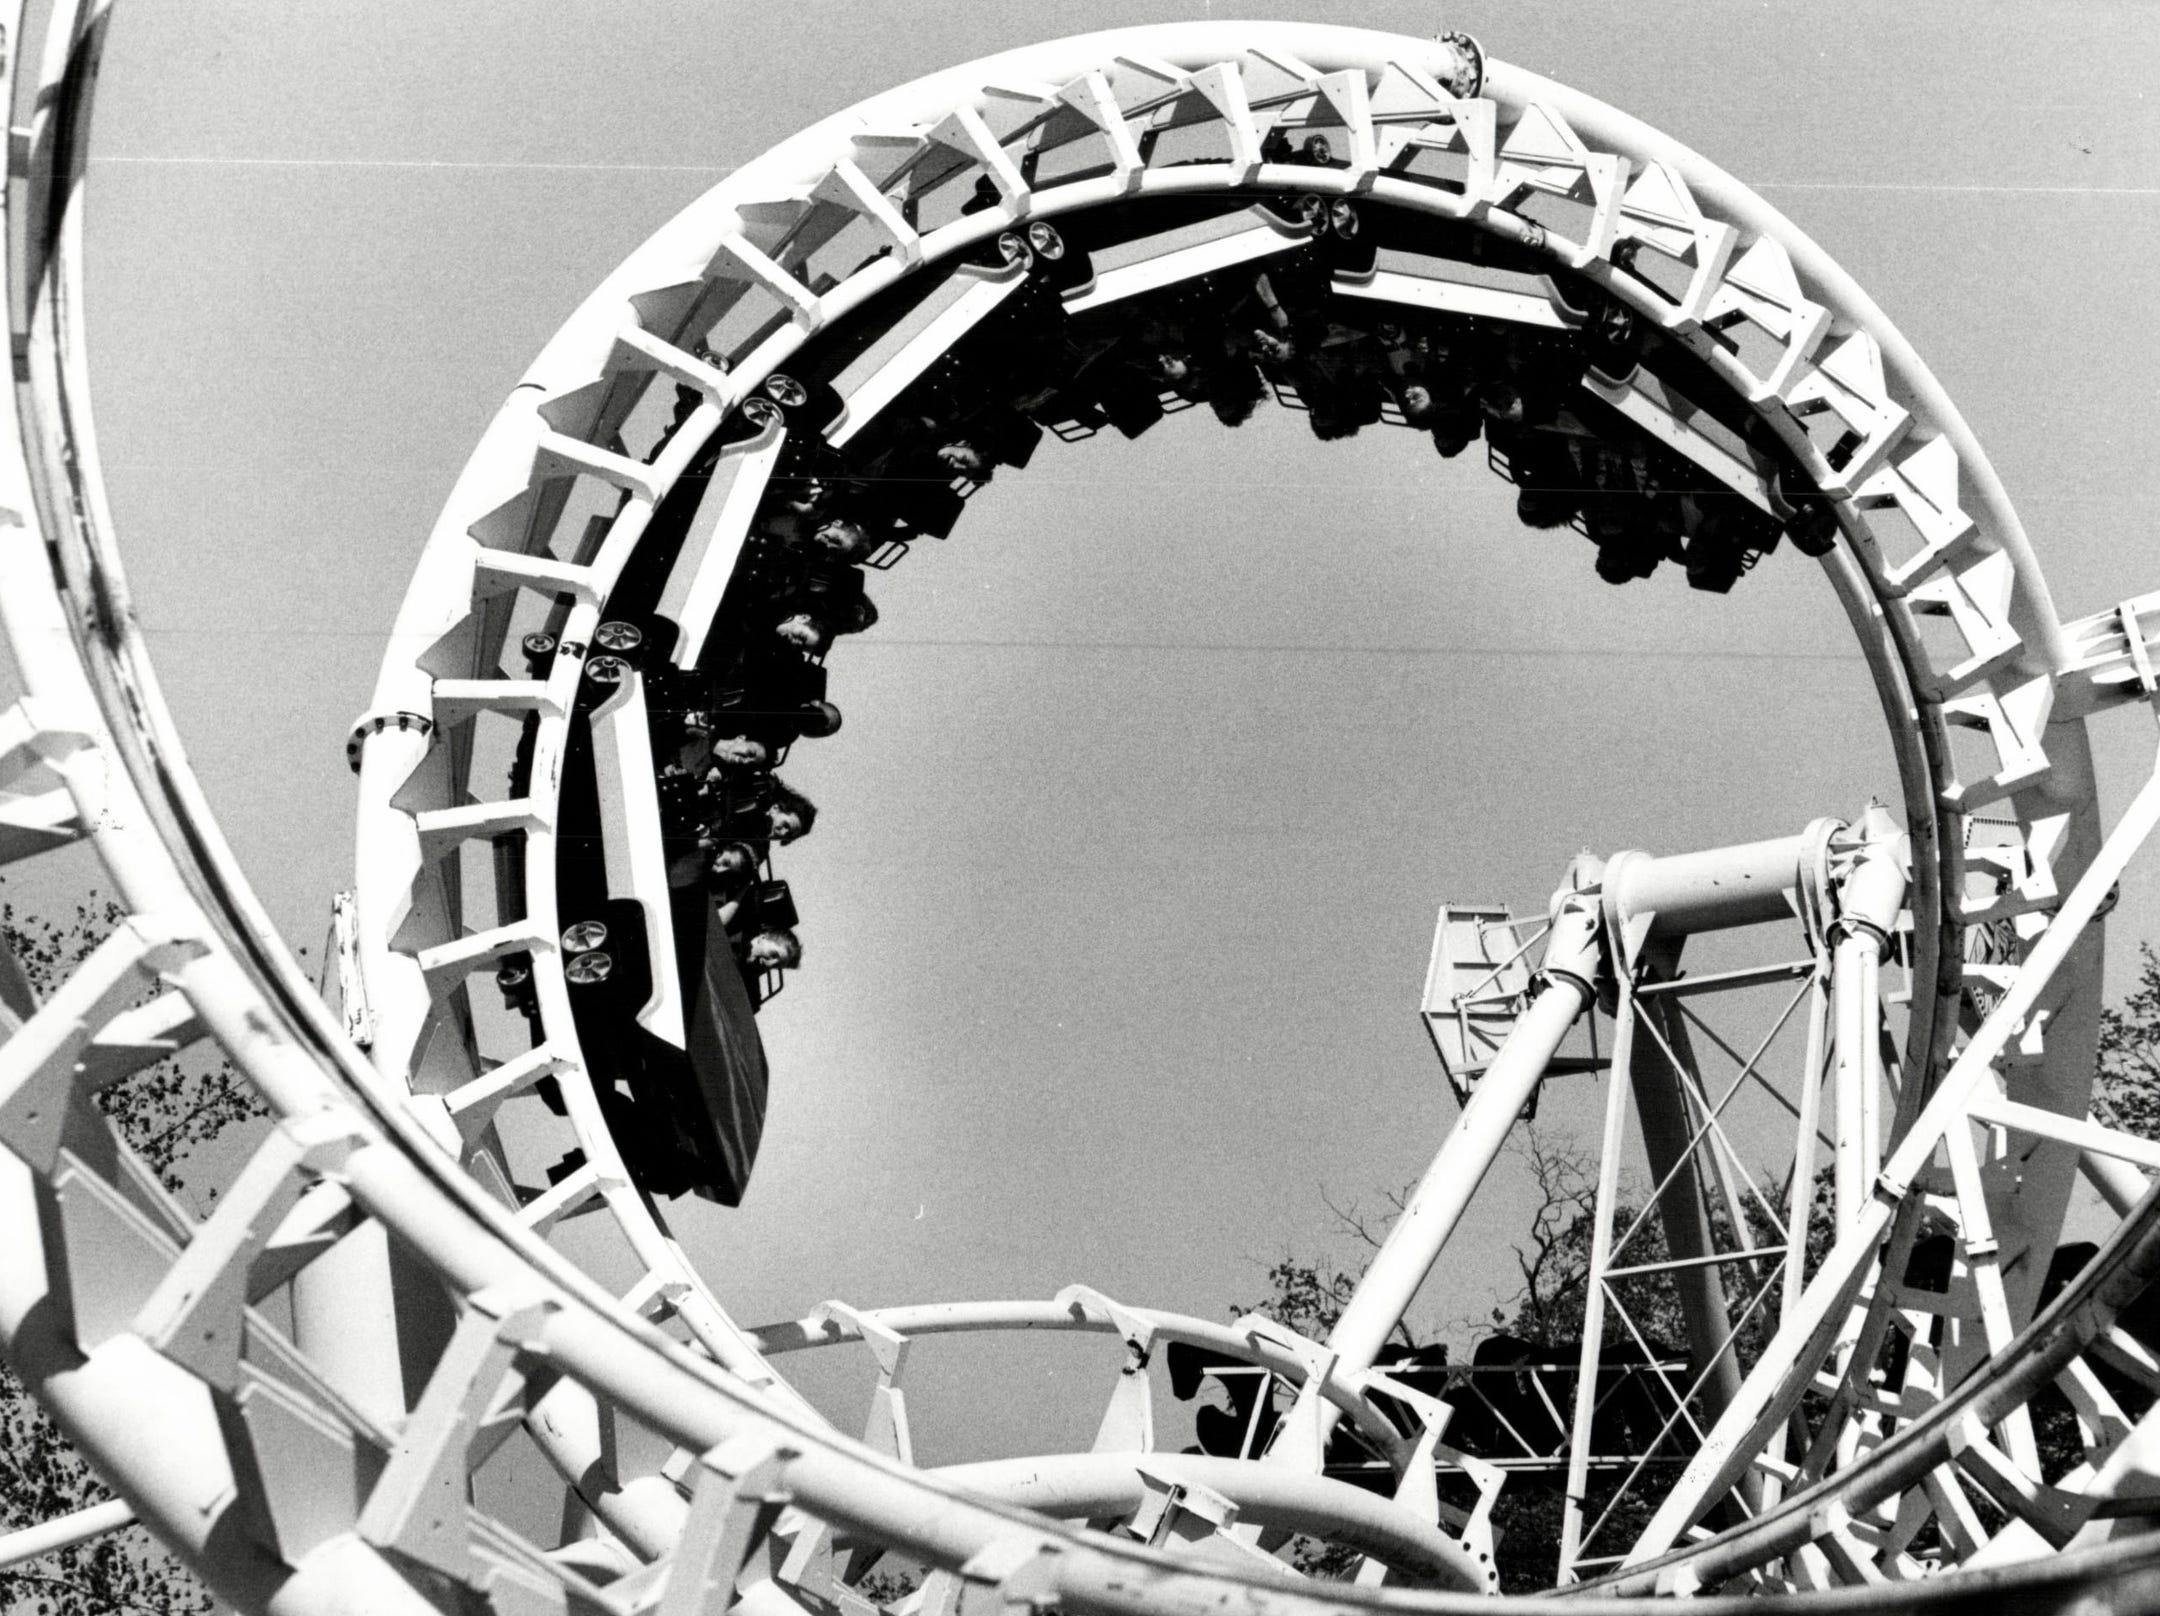 Riders enjoy the corkscrew roller coaster on Boblo Island